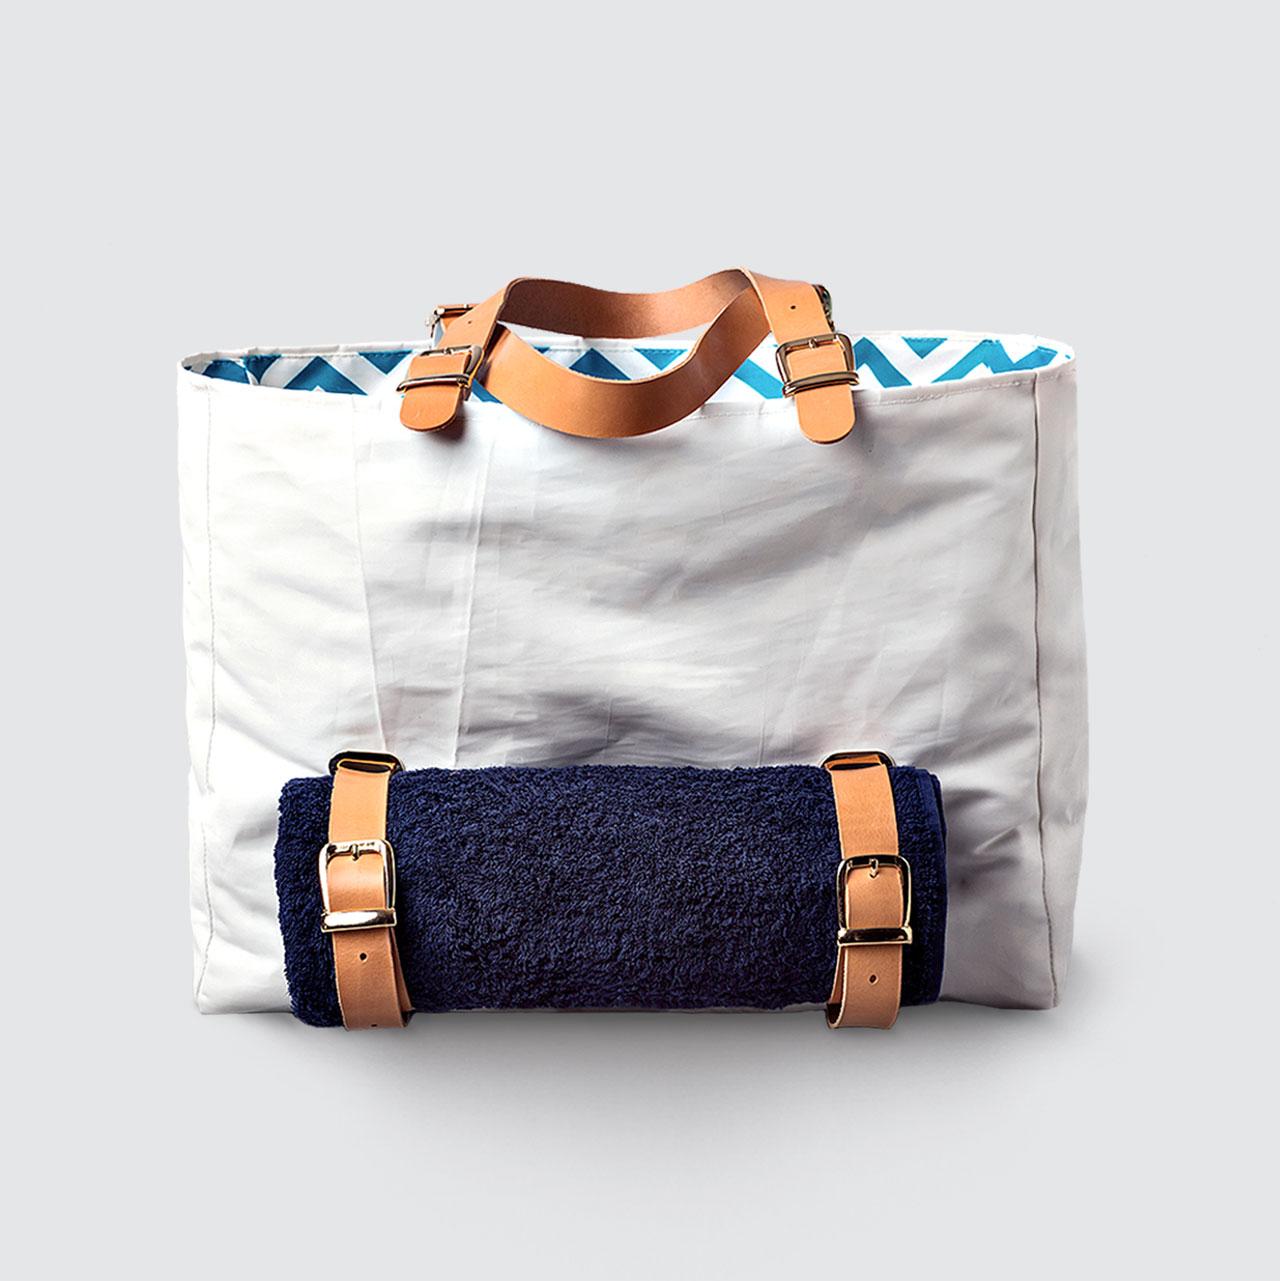 Armathea Beach bag by SALTY BAG.Photo by Nikolas TsakrisModel: Michelle Schermer, Ace Models Styling: Nikos ZanasMake Up: Gianna GiohalaHair: Agatha Chrysikopoulou